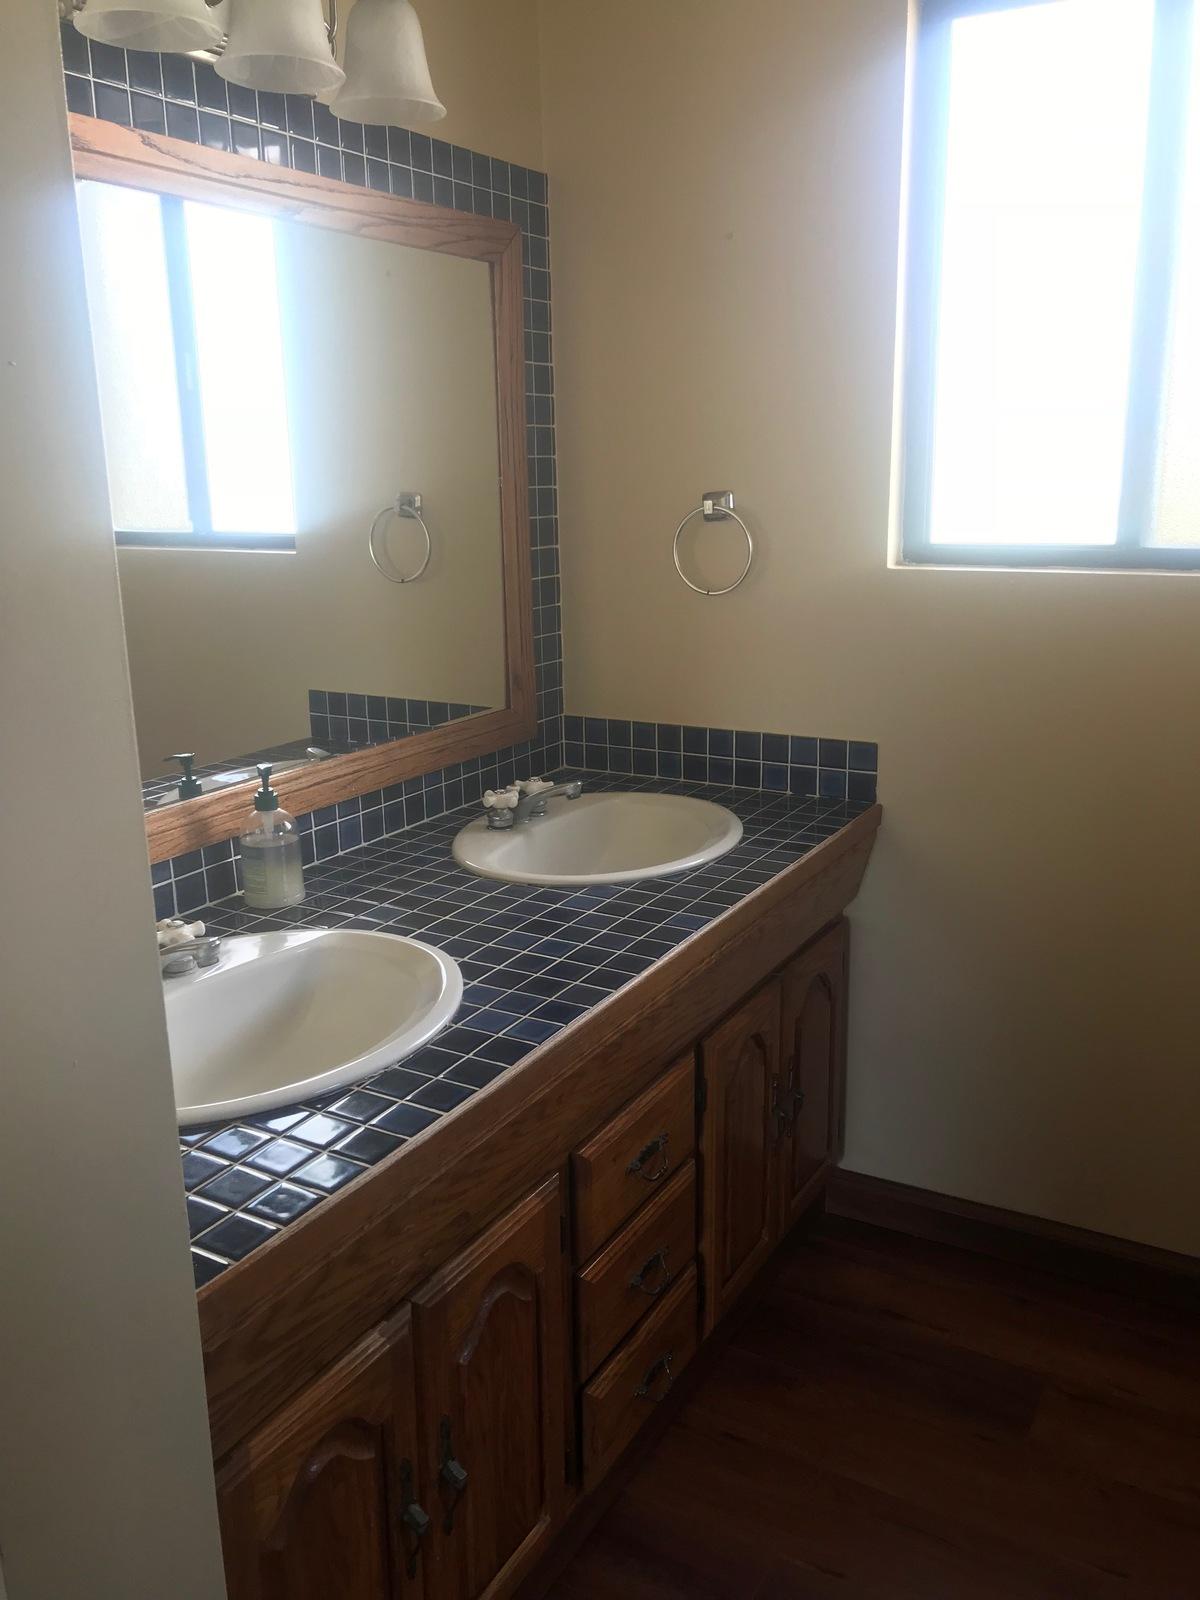 14 de 28: Doble lavabo (recamara principal)